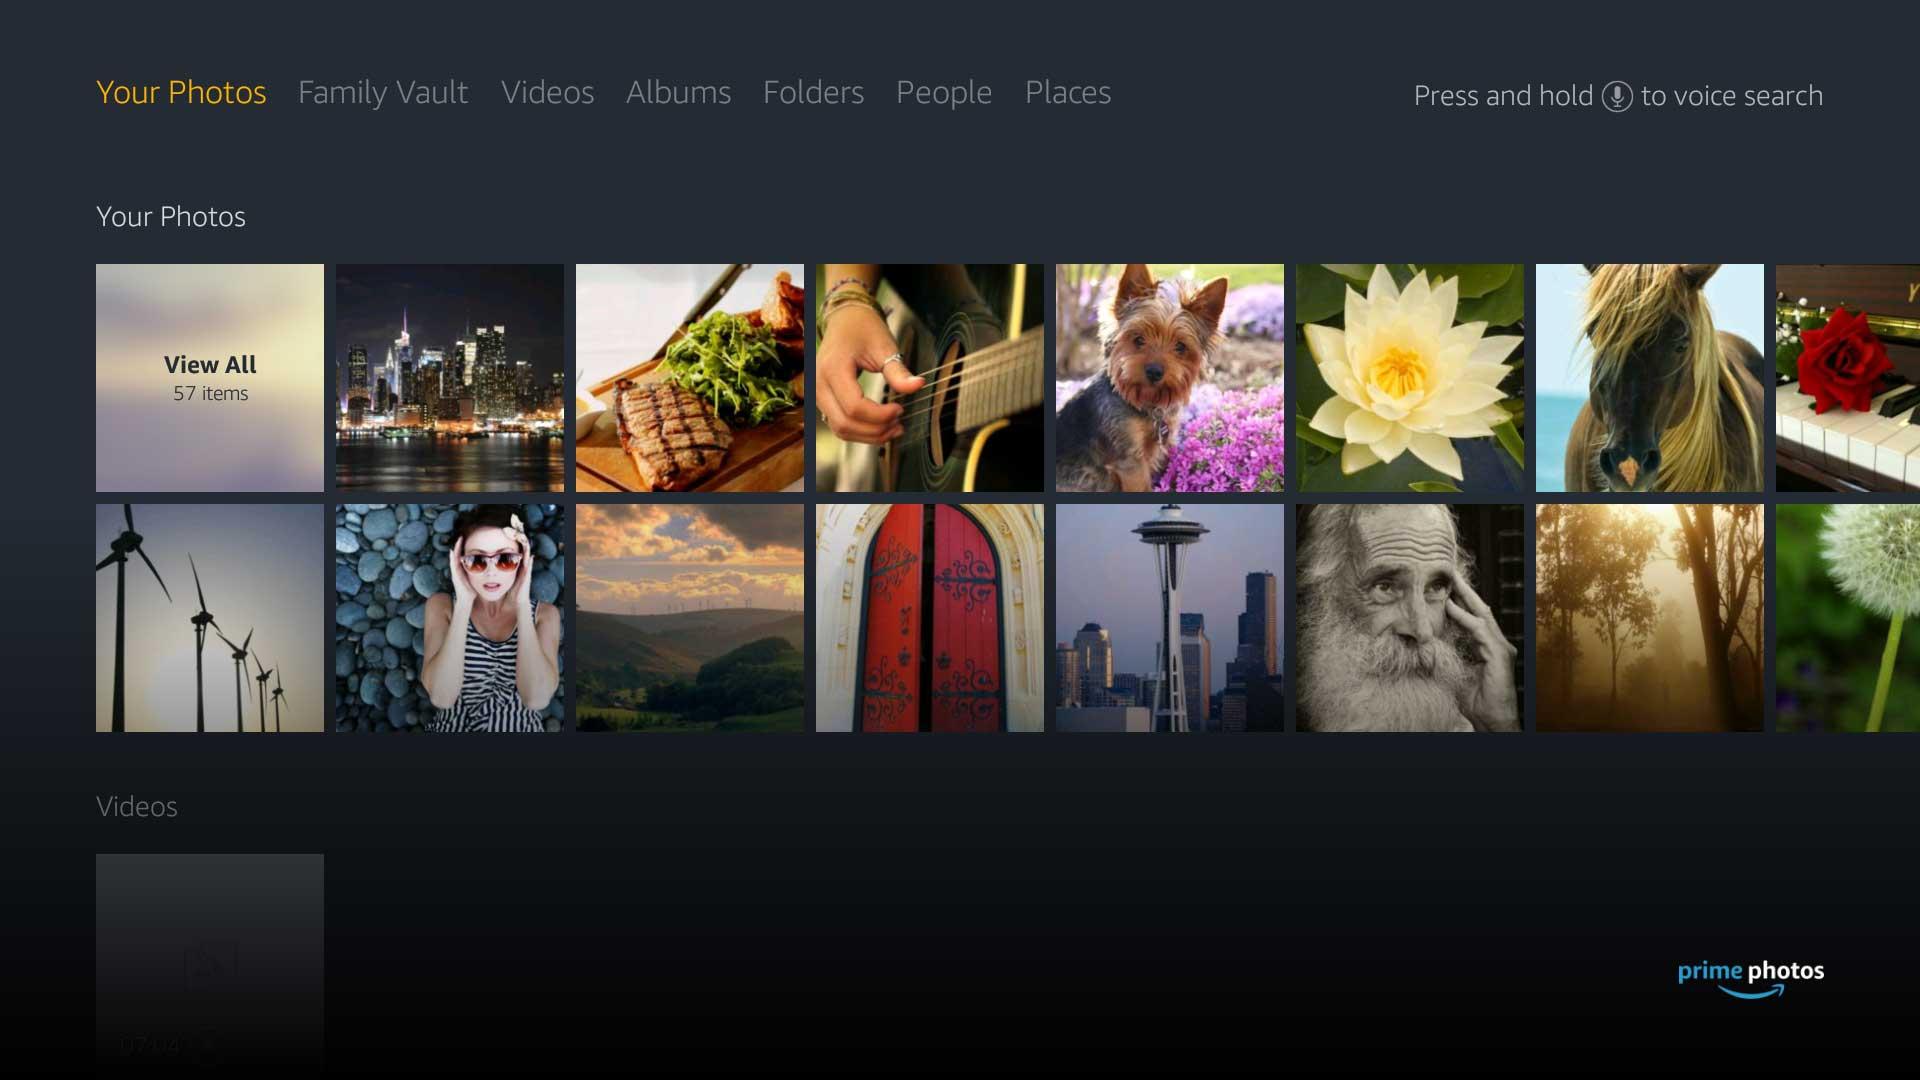 Prime photos app home screen aftvnews - Home design shows on amazon prime ...